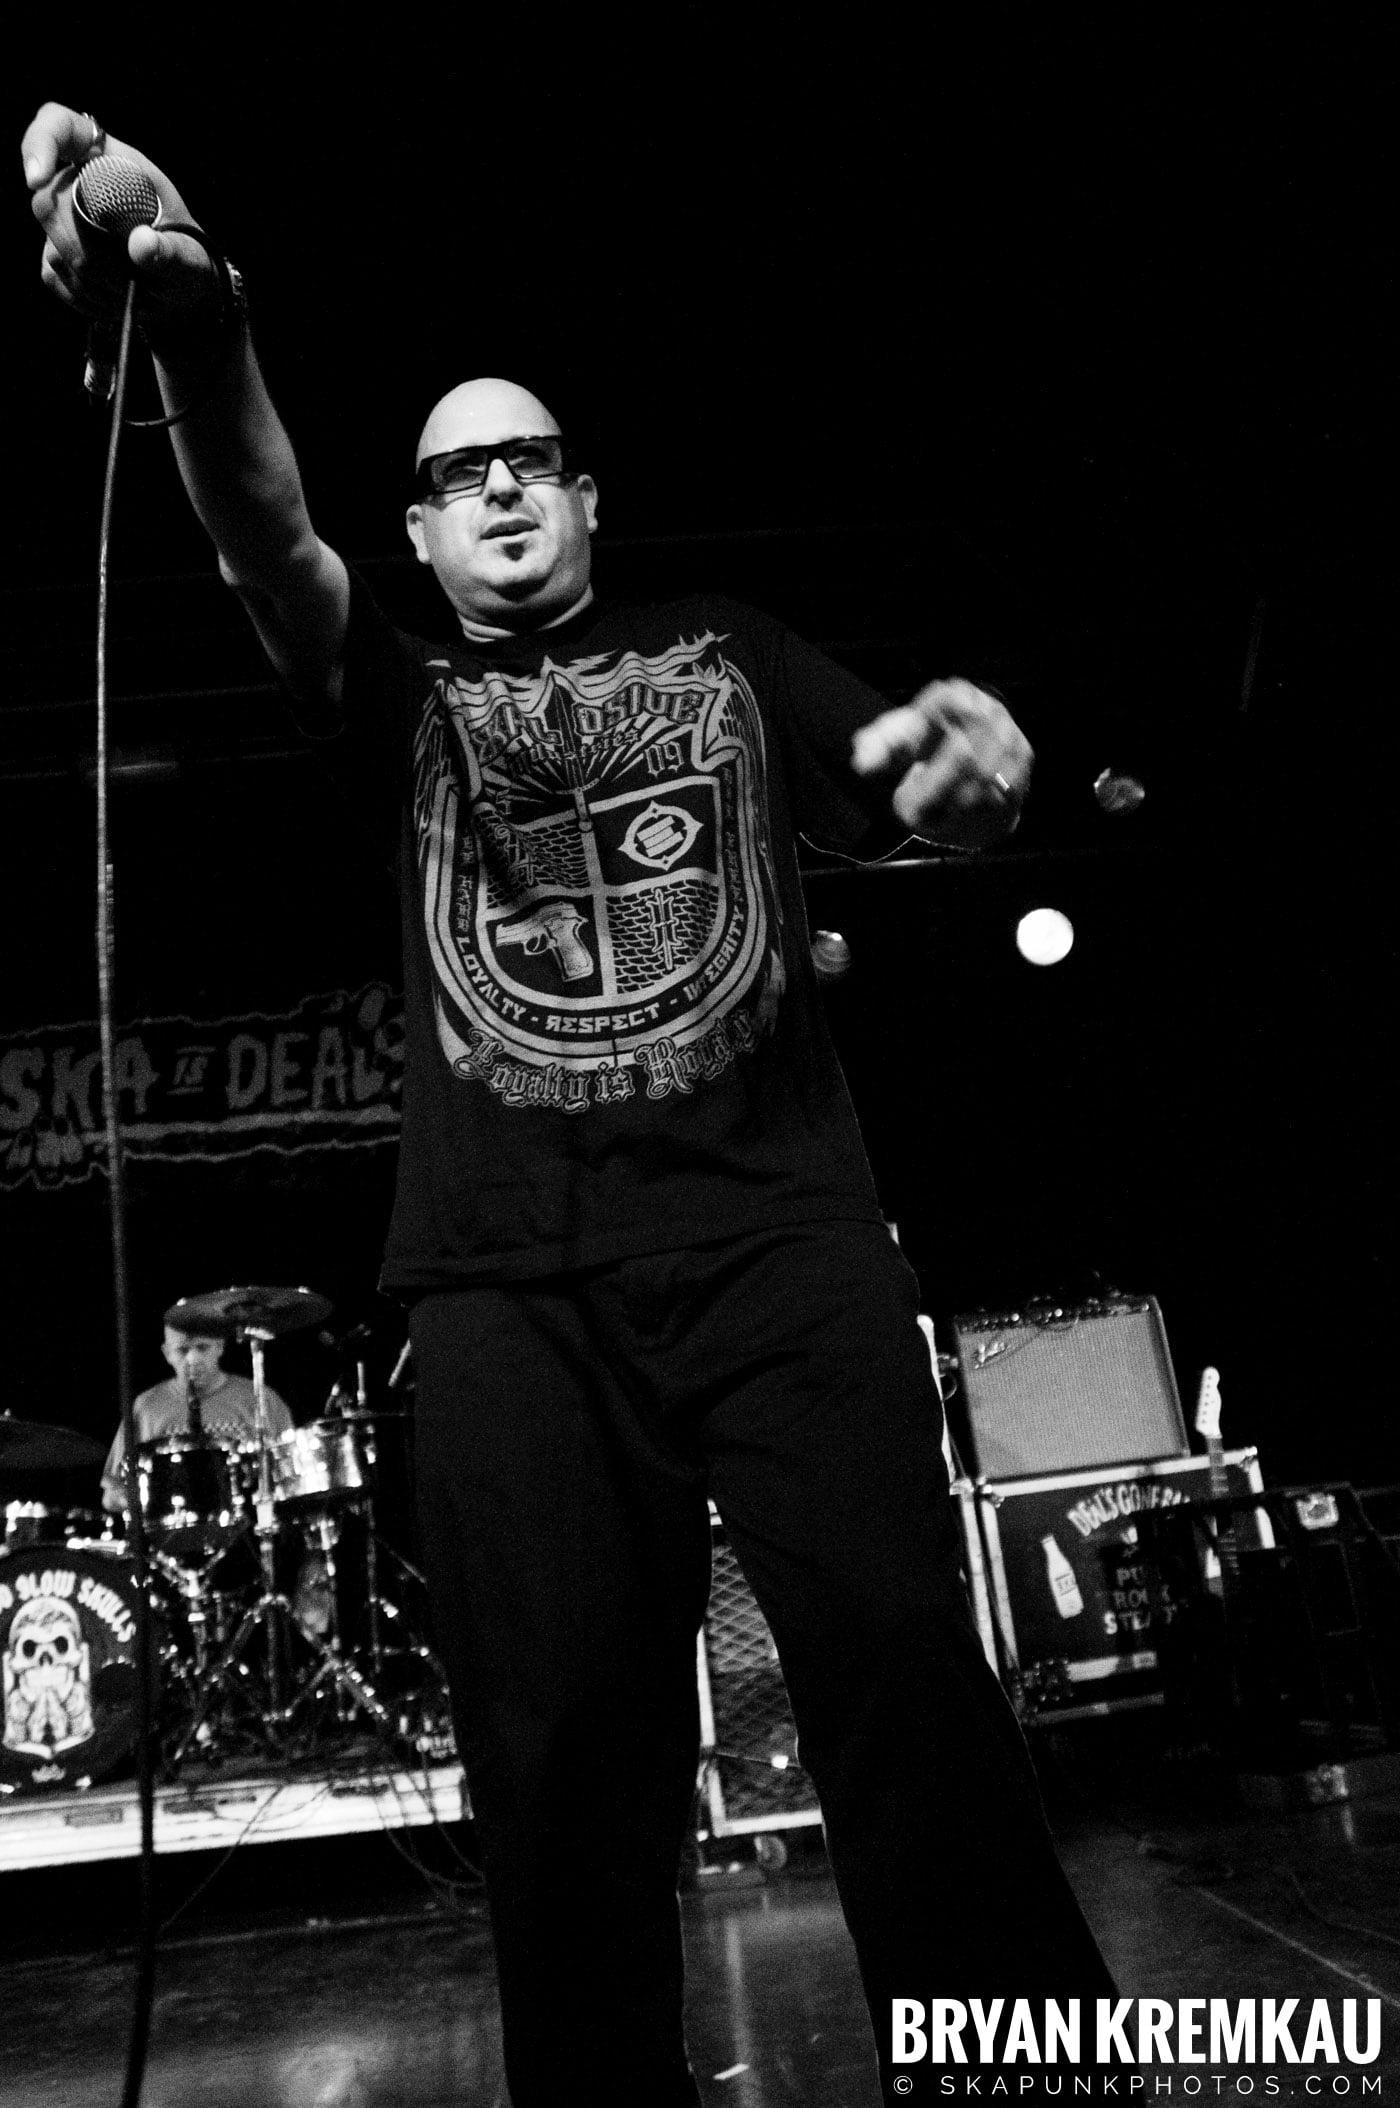 Voodoo Glow Skulls (Ska is Dead Tour) @ Starland Ballroom, Sayreville, NJ - 11.15.09 (3)